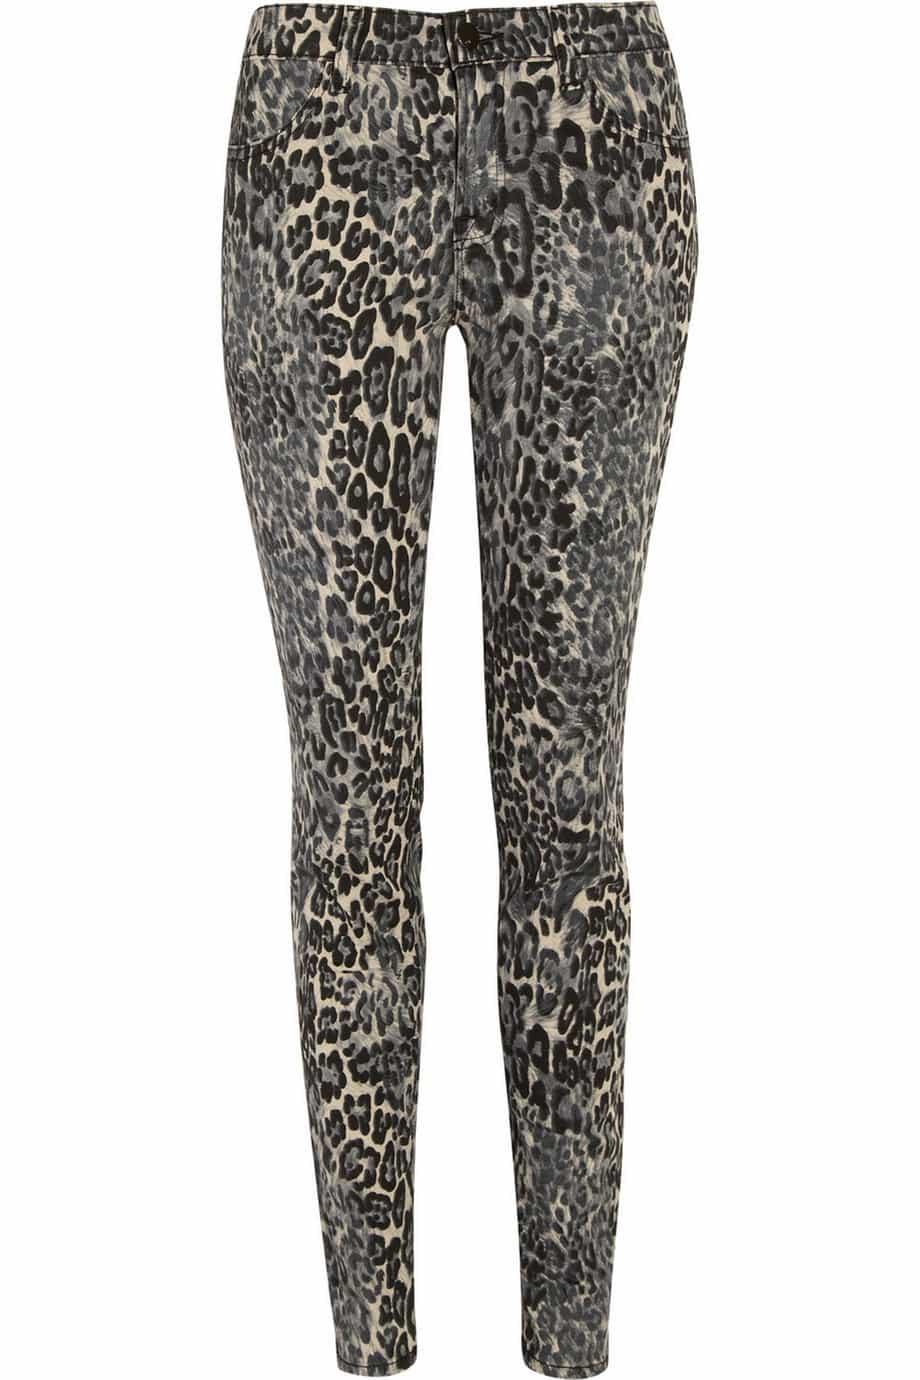 J Brand Denim Leopard-print mid-rise skinny jeans Original price £250 Now £112.50 55% off